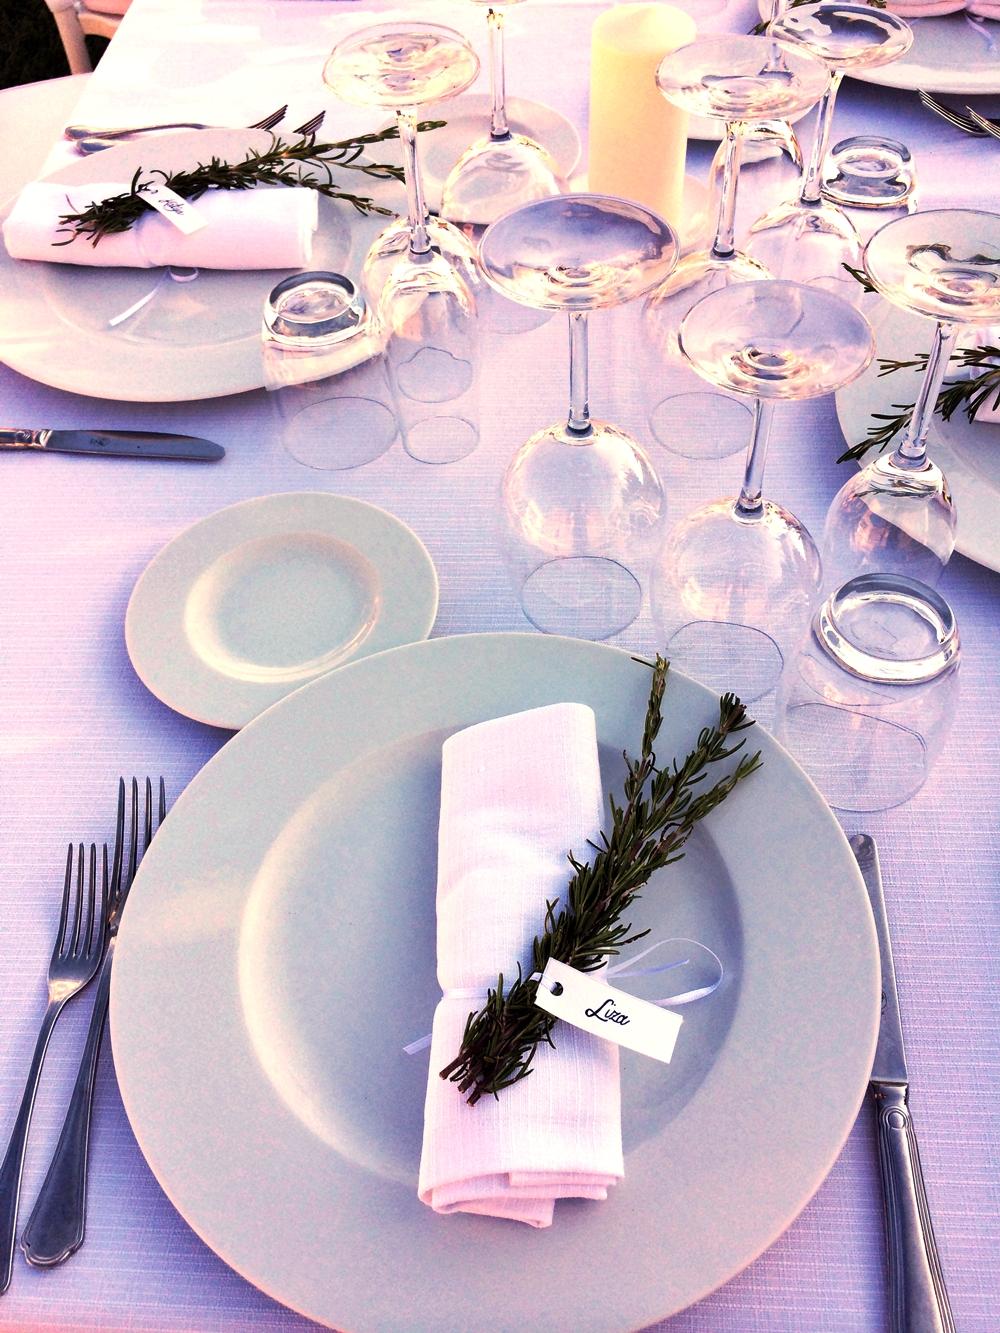 Apulian_wedding_IntheMoodForLove (4)